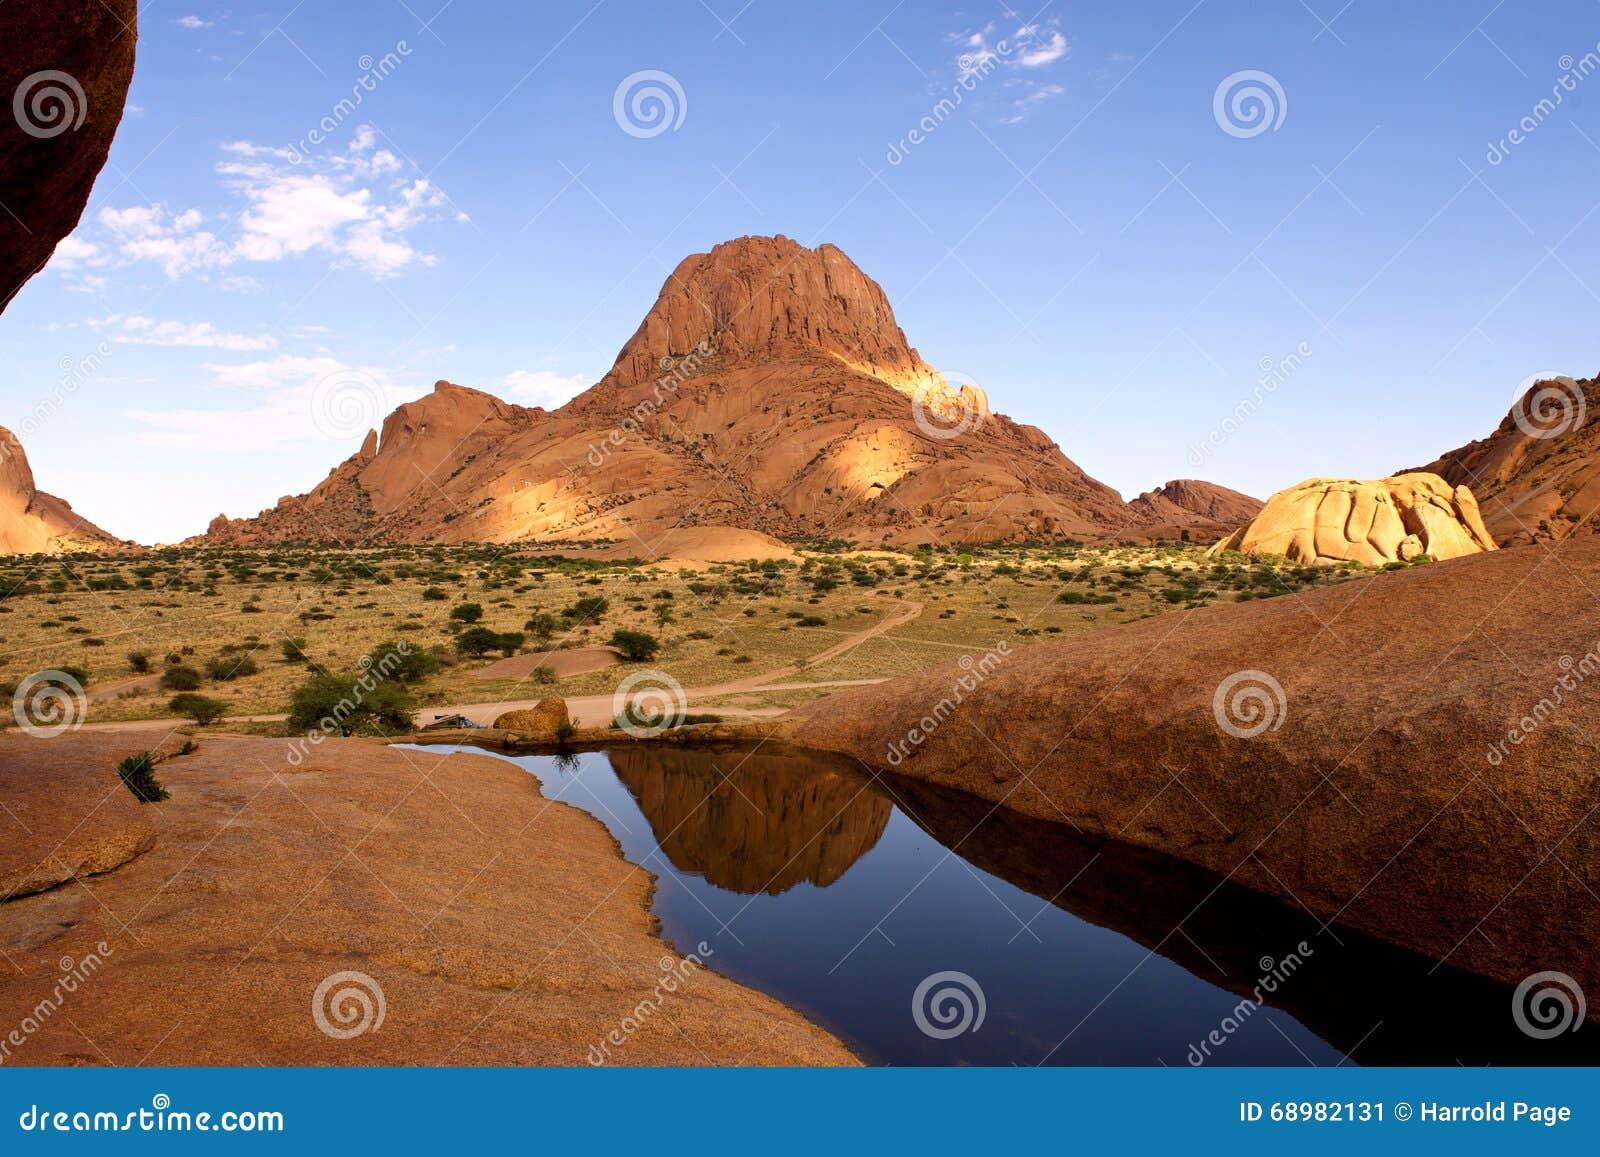 Spitzkoppe, Erongo, Namibia